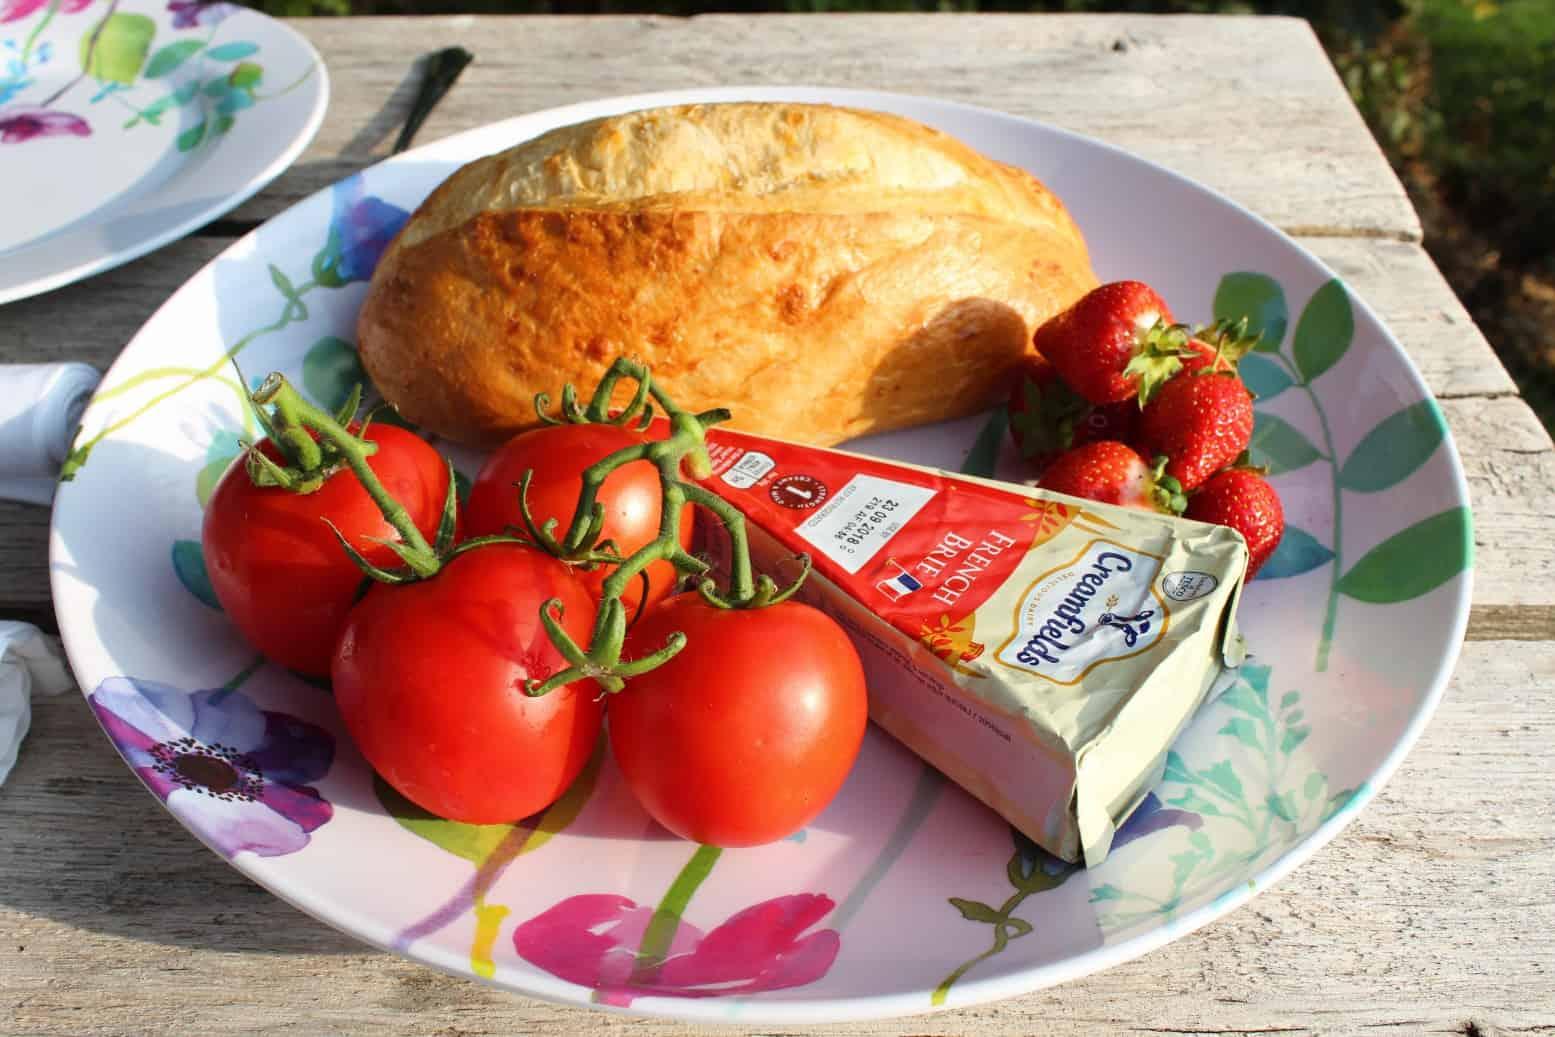 Portmeirion Water Garden Melamine Tableware Review